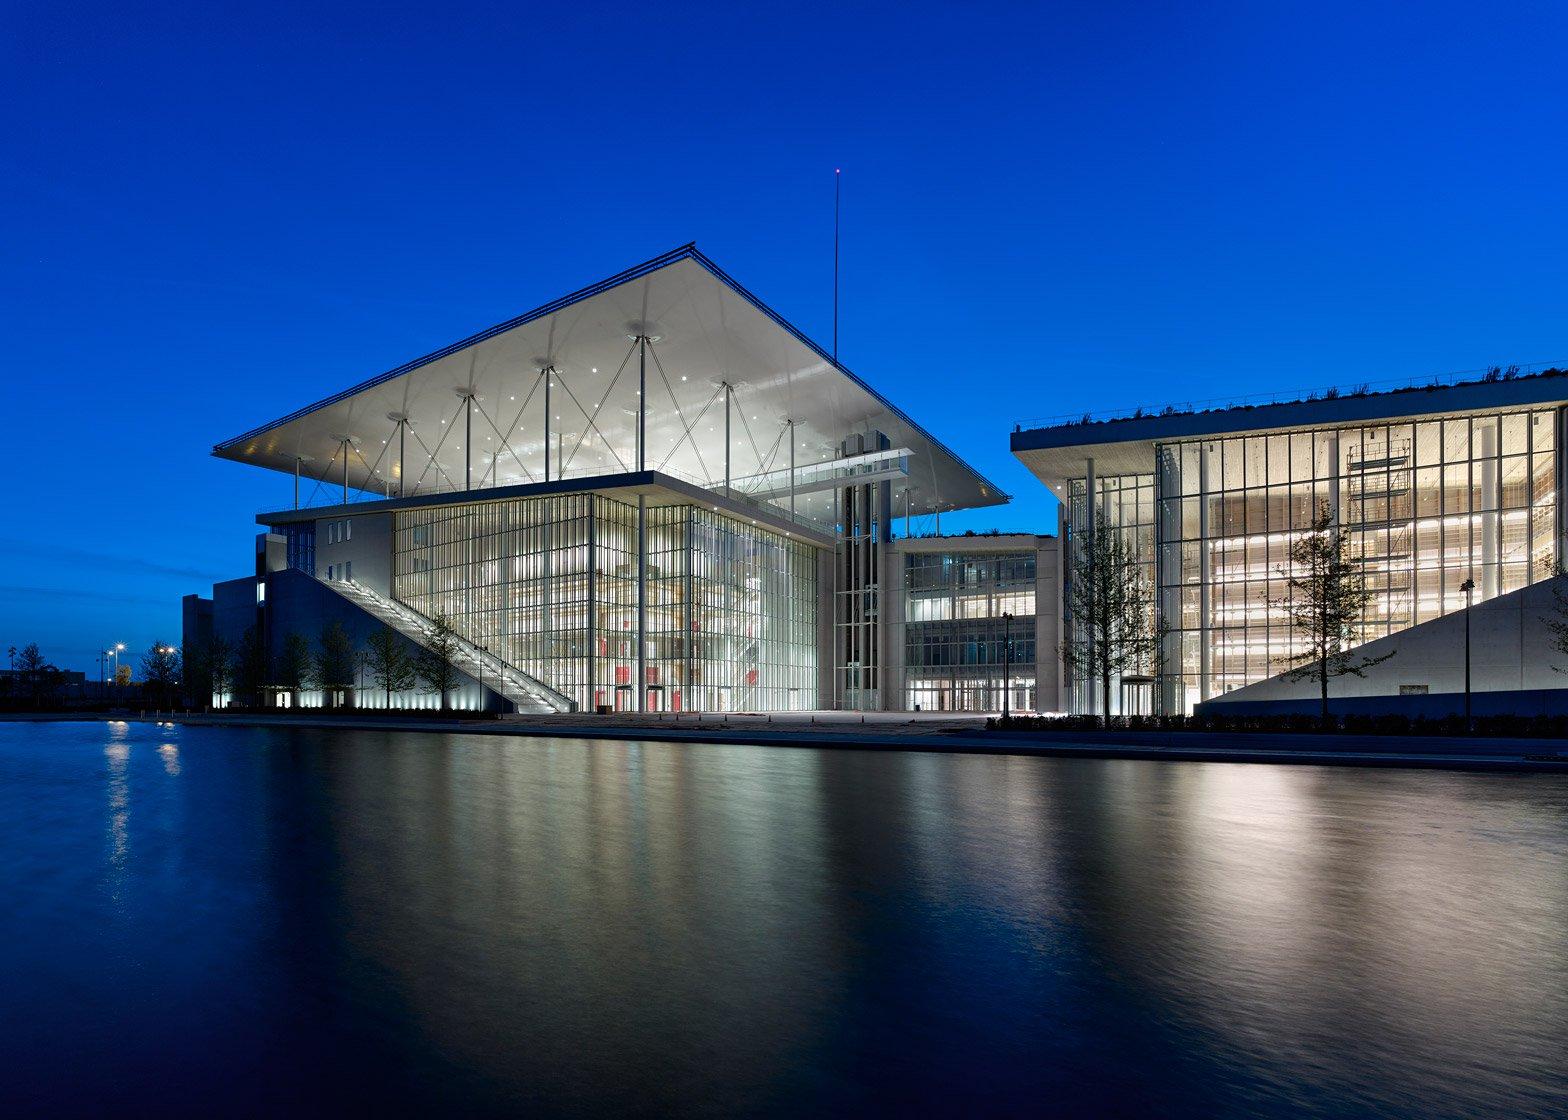 Stavros-Niarchos-Foundation-Cultural-Center-Atene-progetto-Renzo-Piano-Building-Worskhop